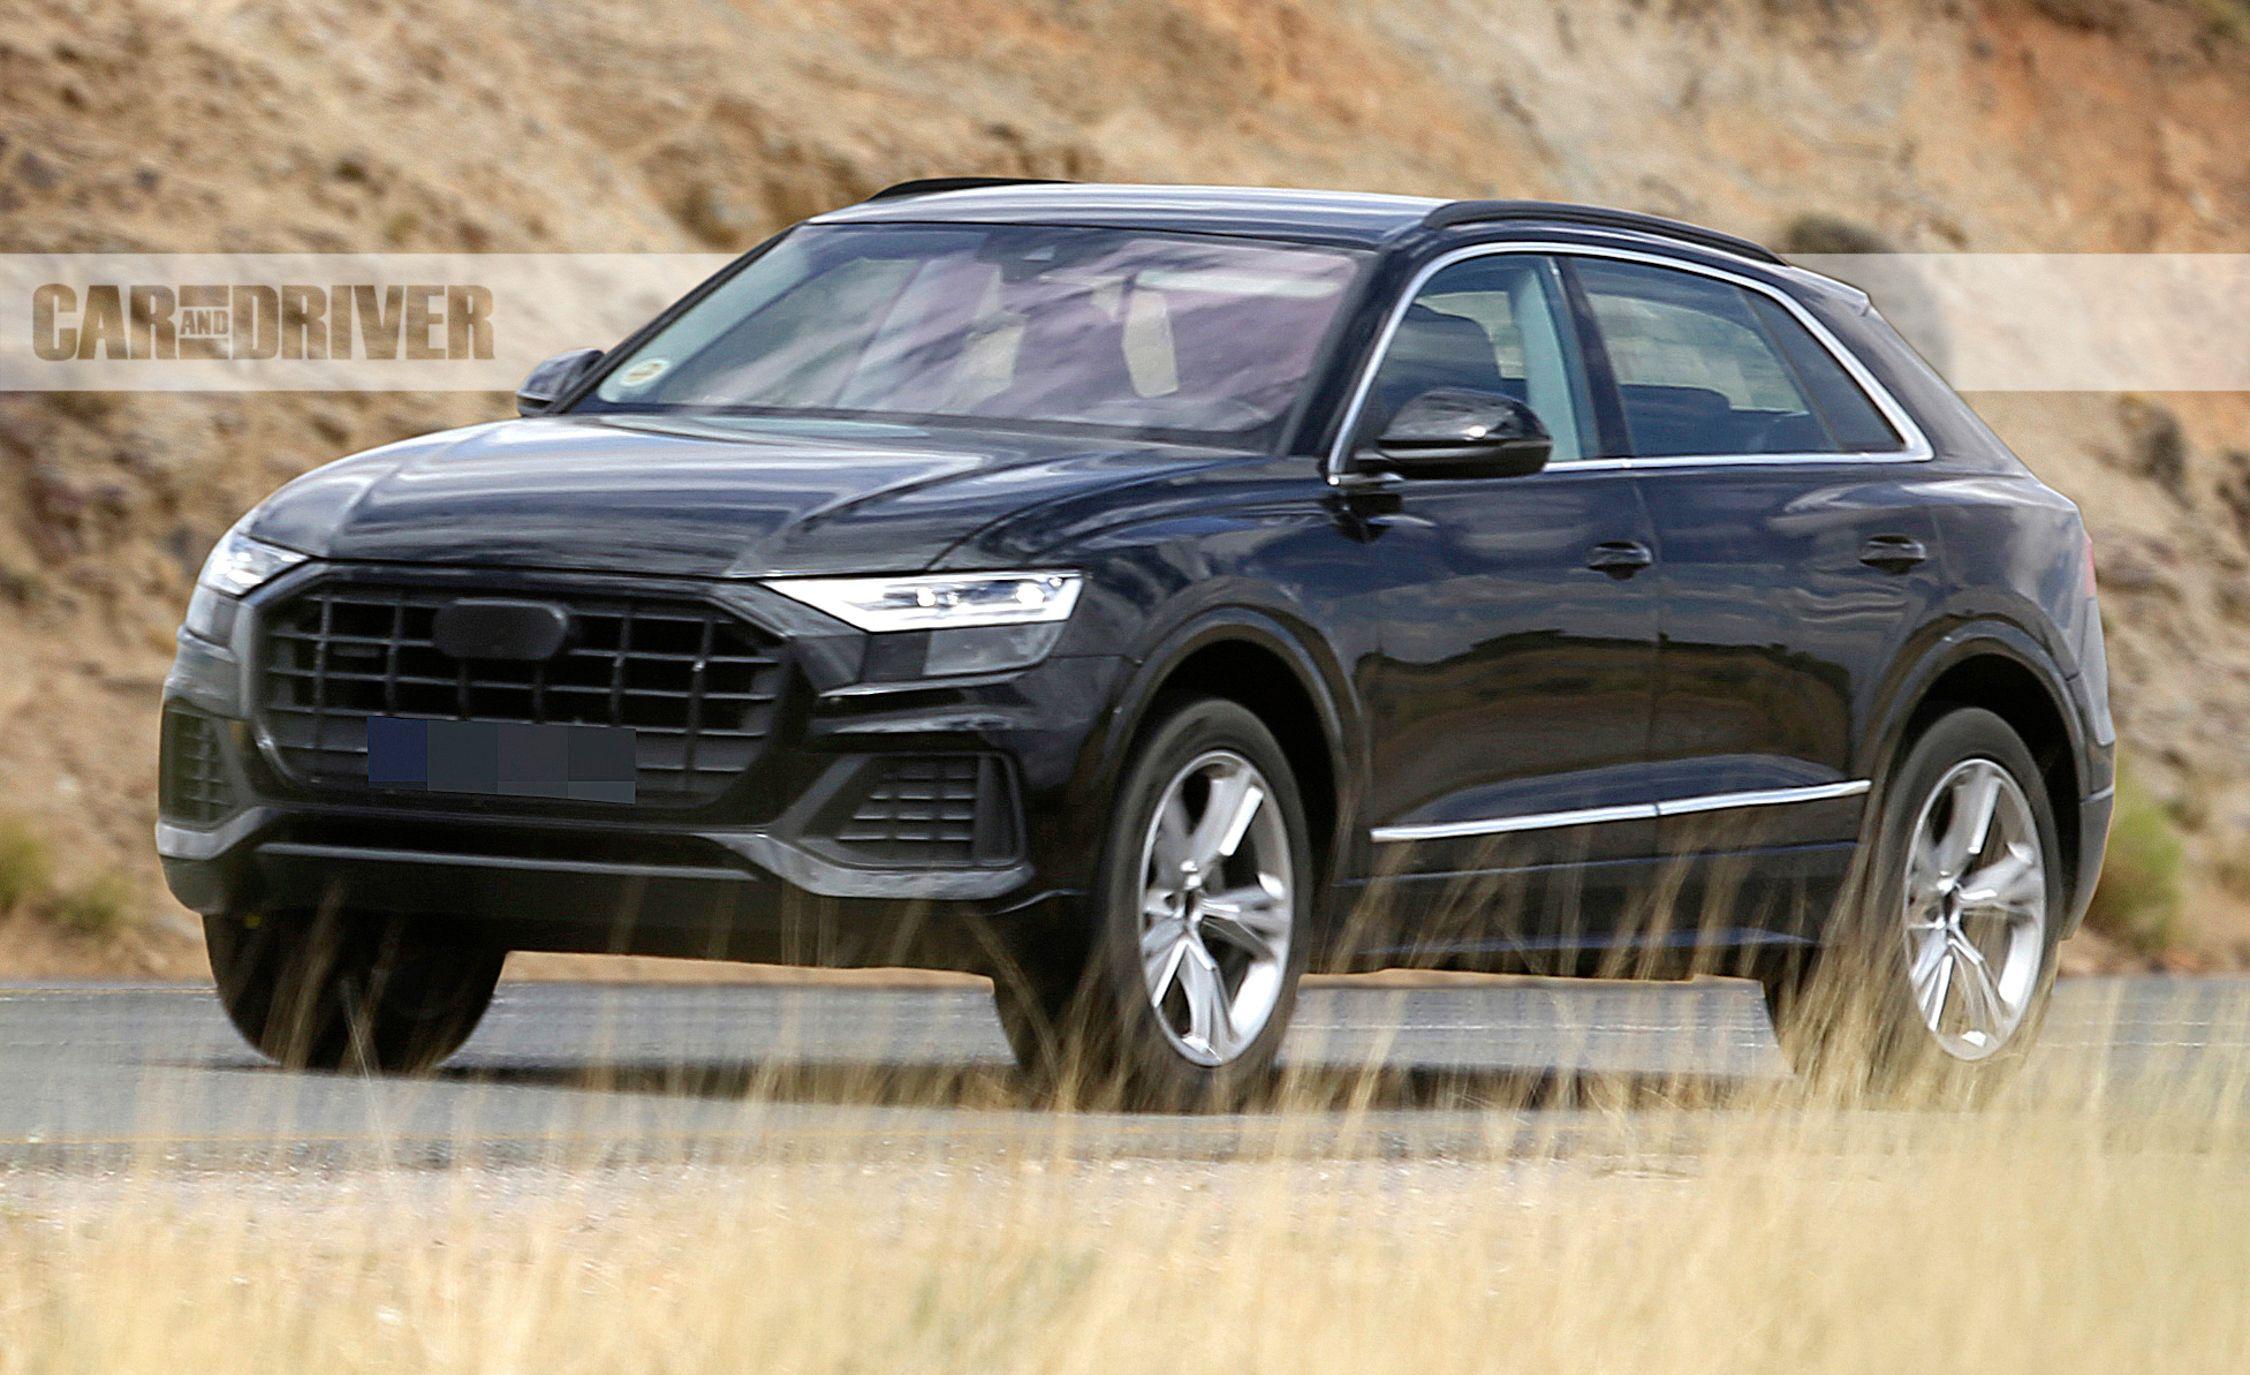 Kekurangan Suv Audi 2019 Top Model Tahun Ini